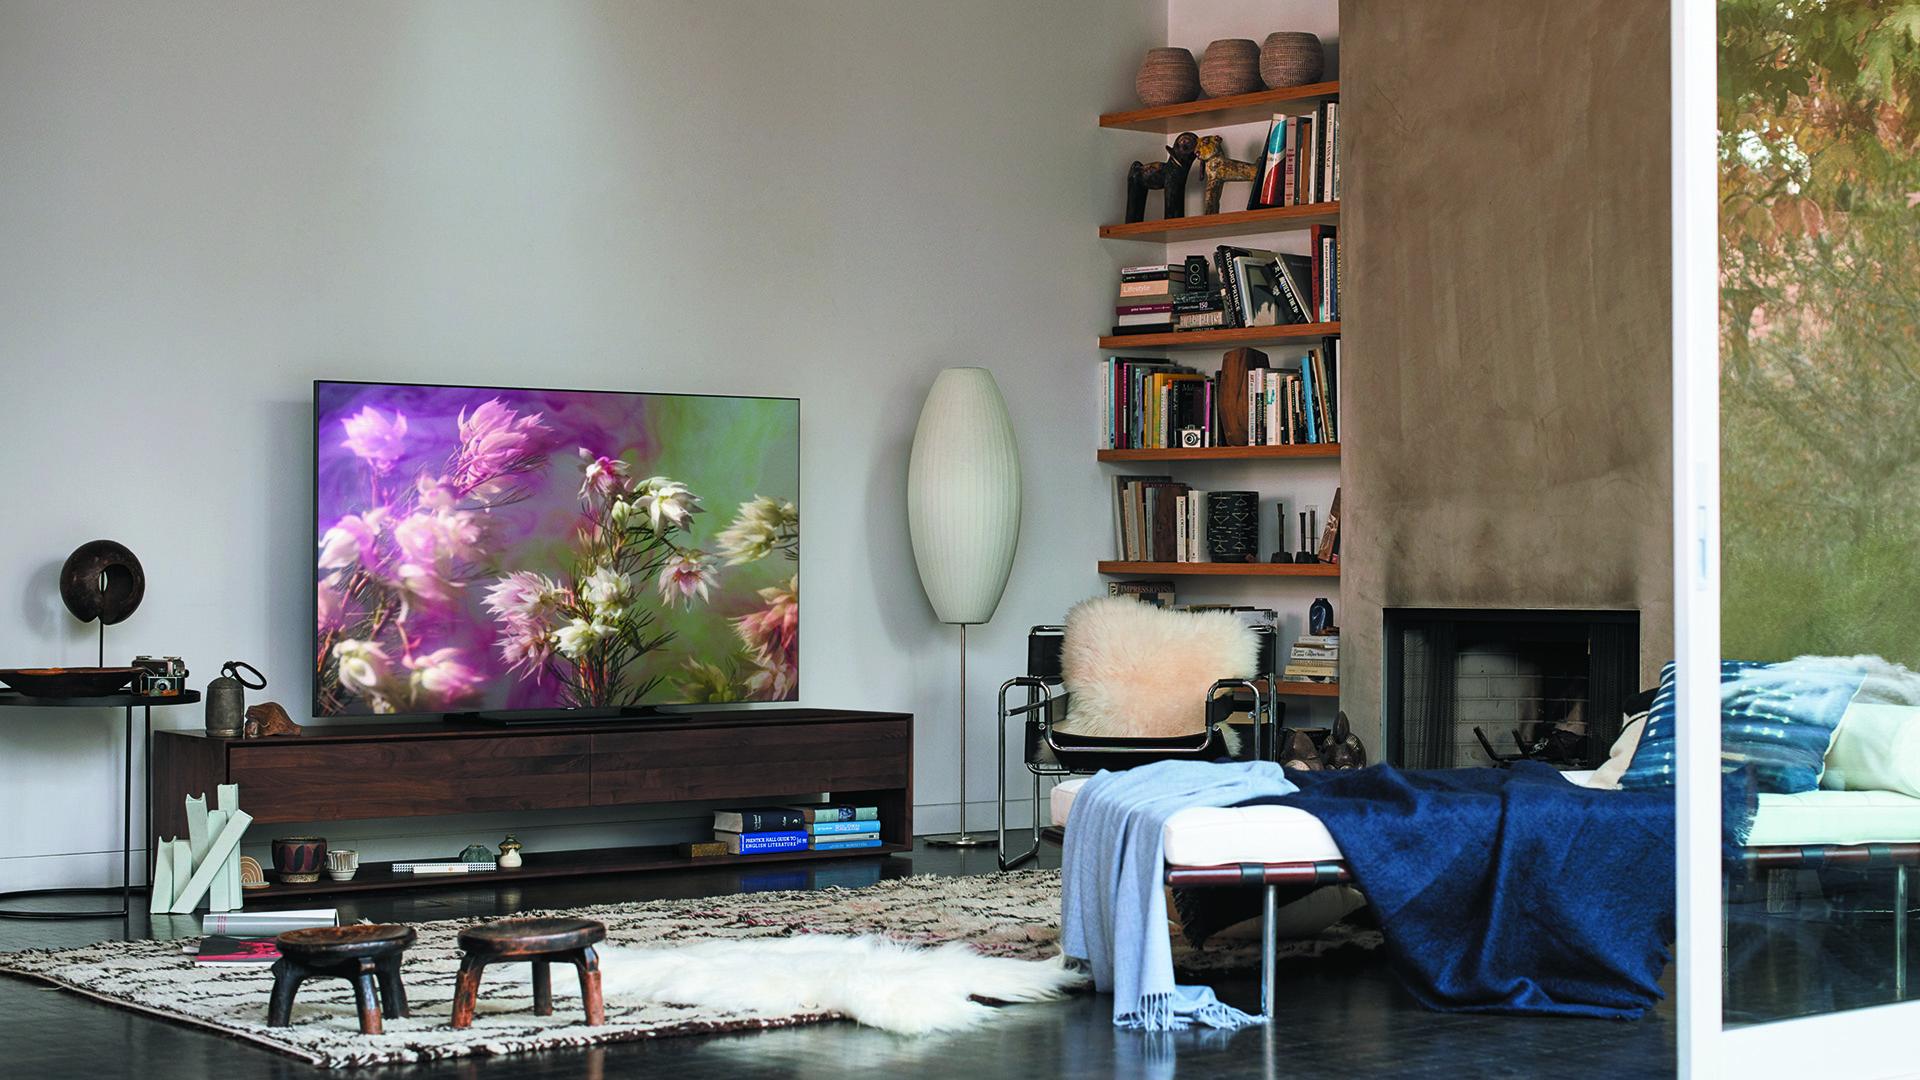 Samsung Q9FN 4K TV